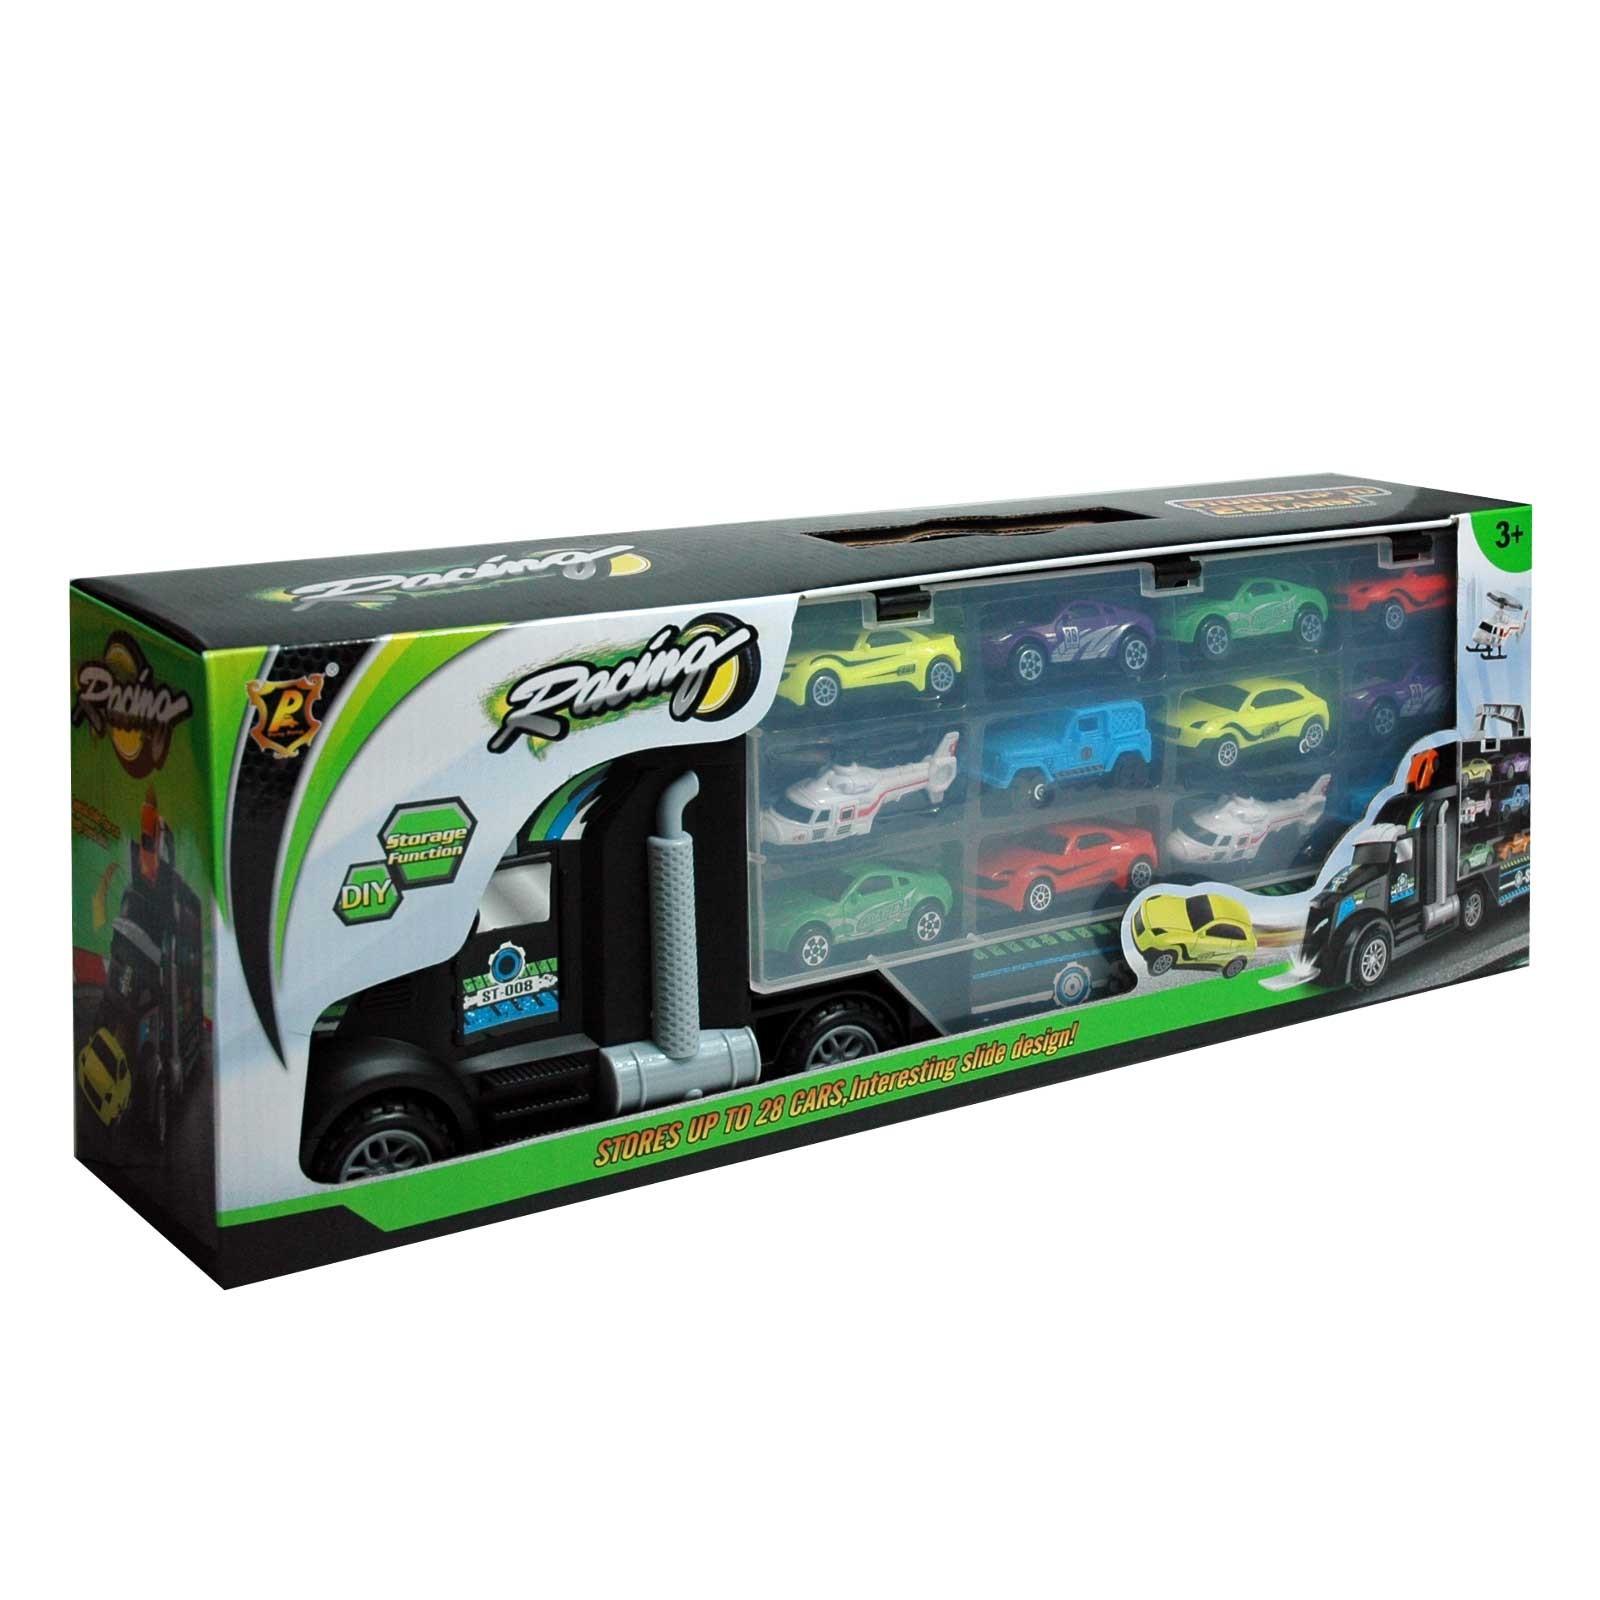 Spielzeug LKW - Autotransporter